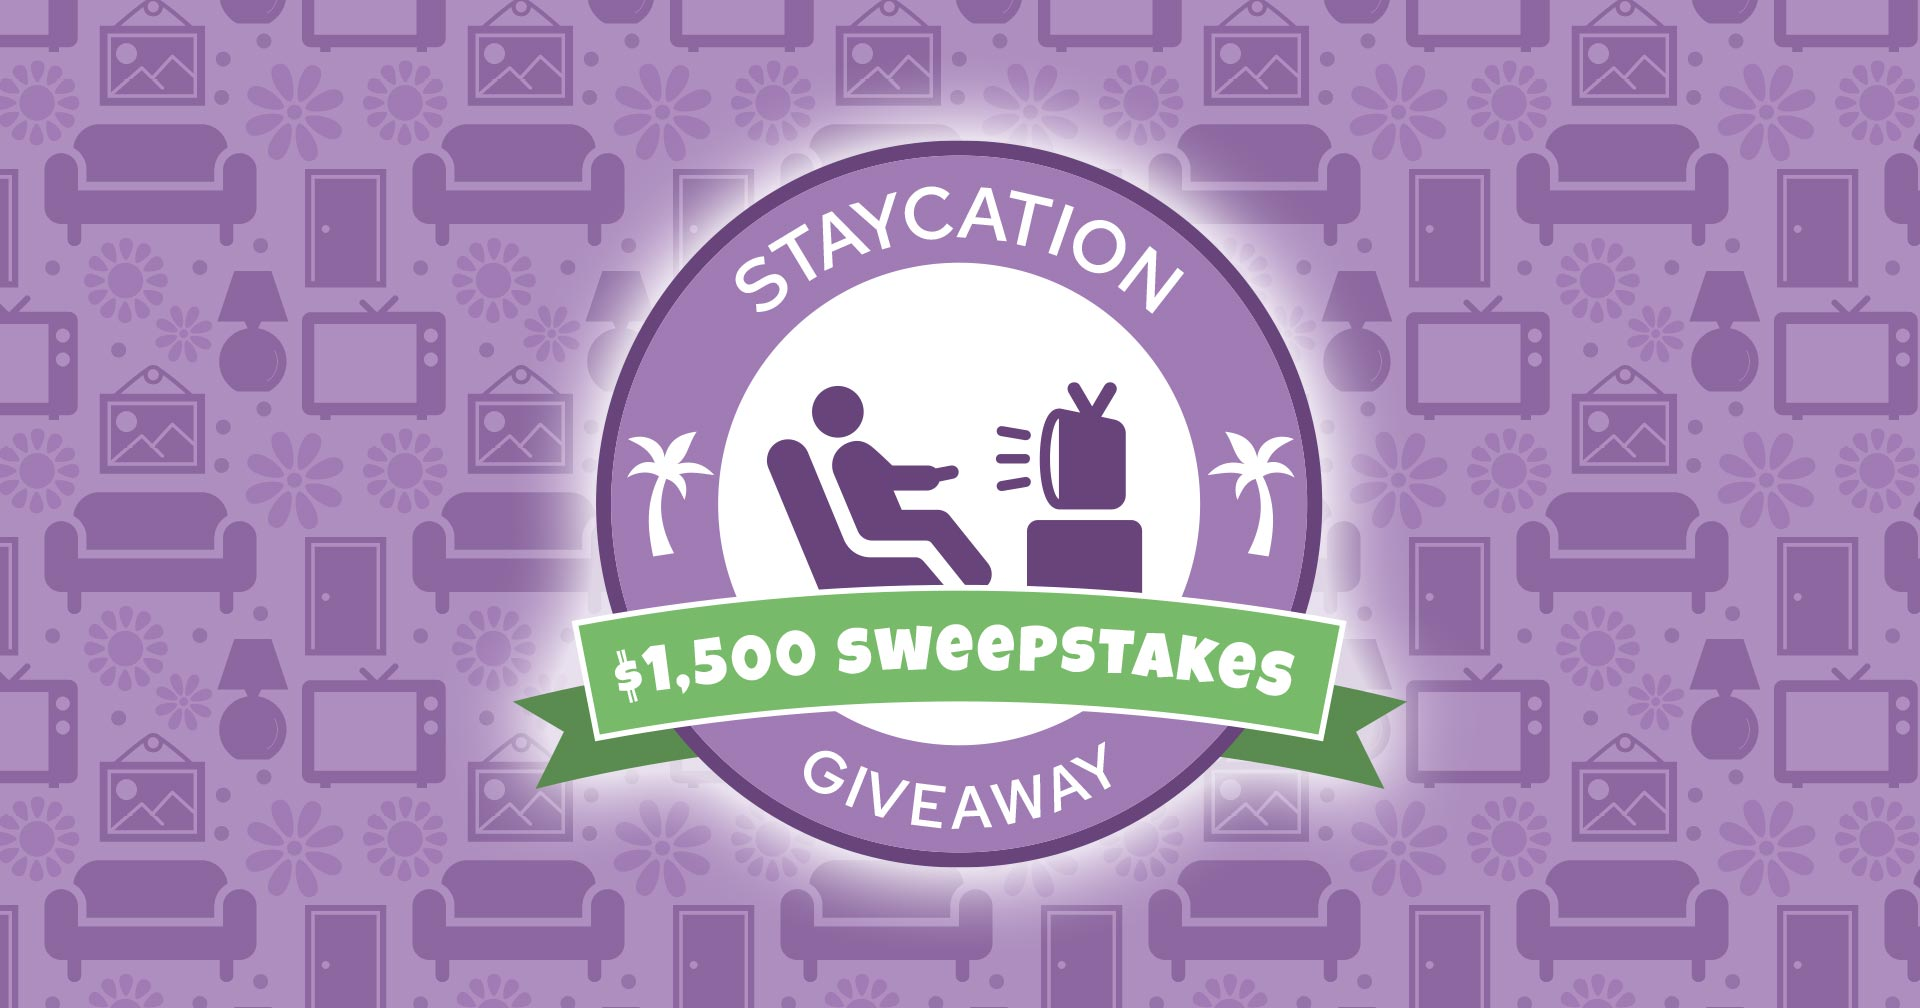 $1,500 Sweepstakes